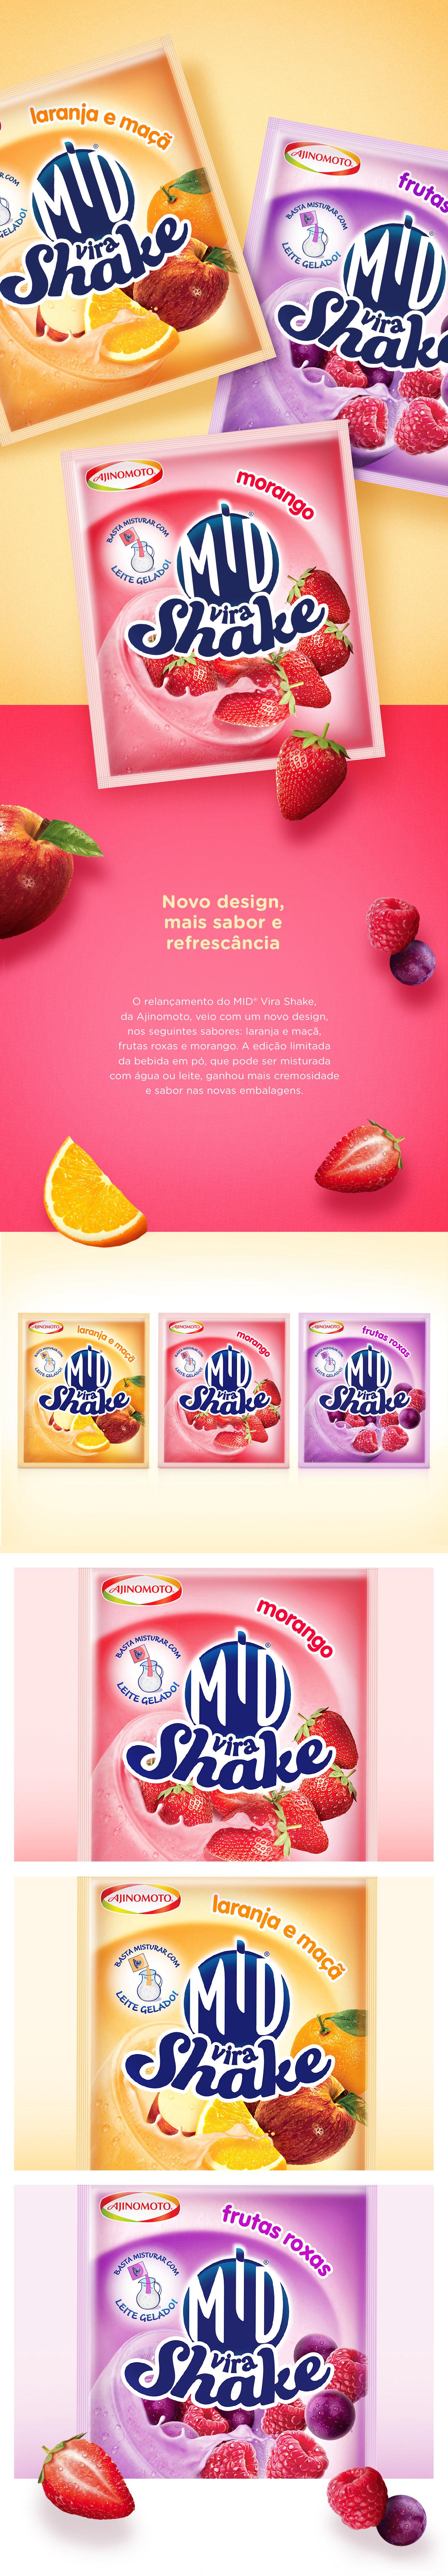 shake juice Fruit apple flavour orange Packaging powdered splash strawberry